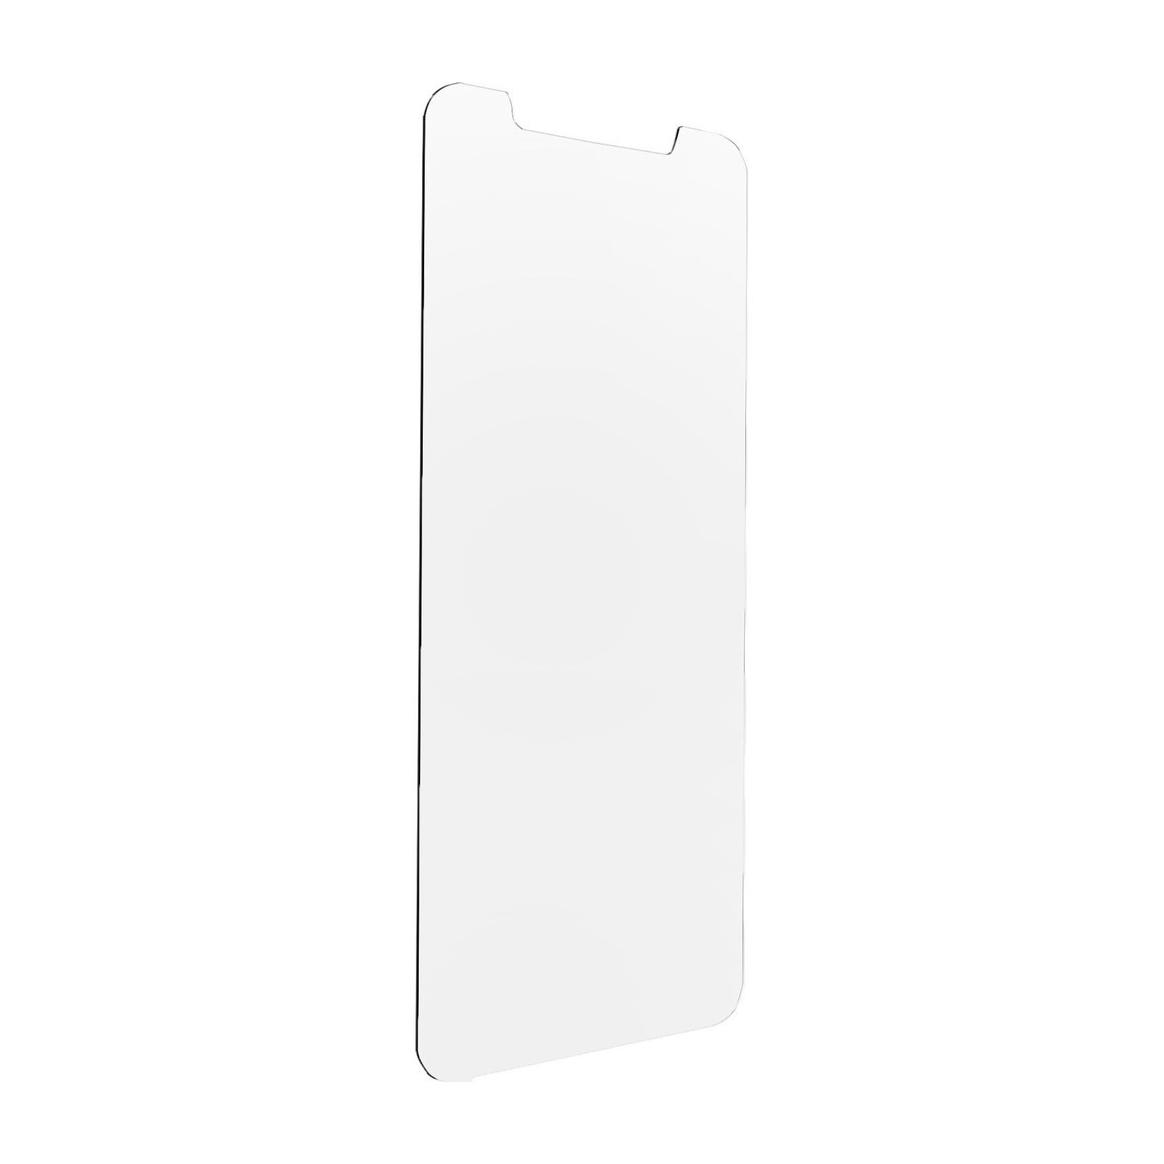 Защитное стекло uBear для Apple iPhone 11 Pro Max/XS Max